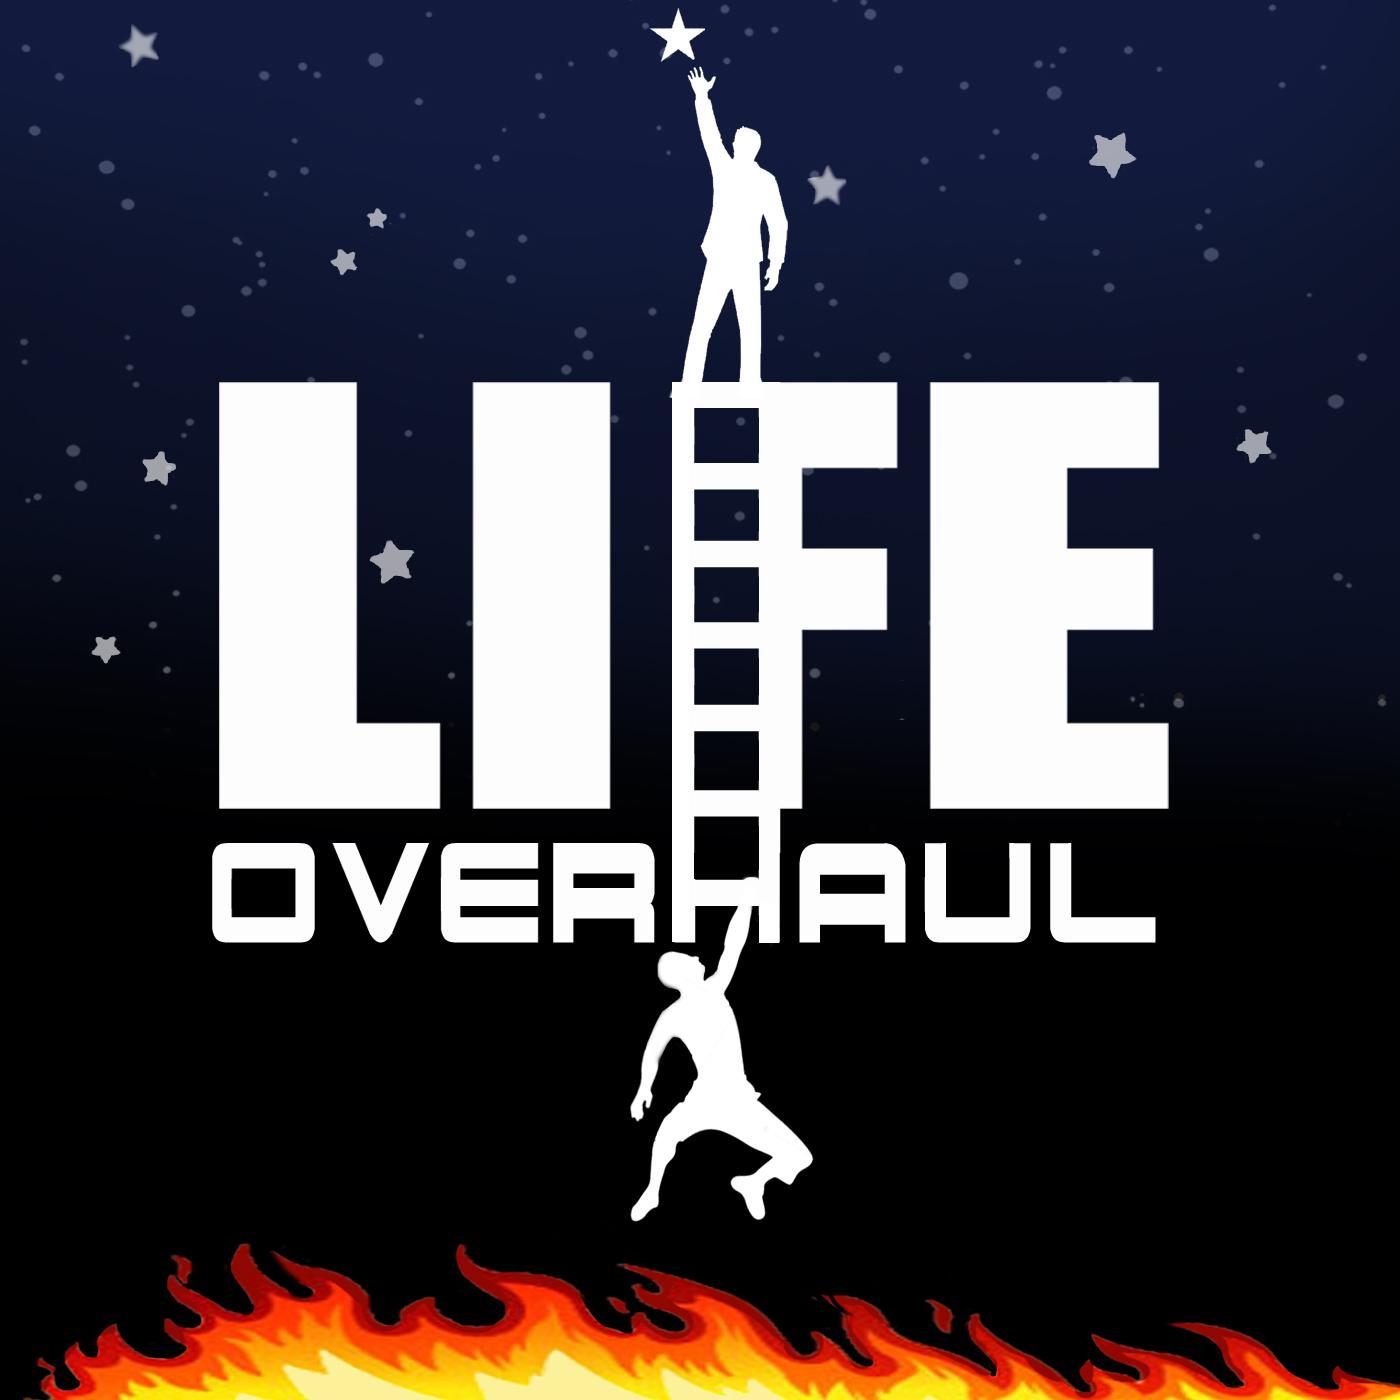 Life Overhaul - Chpt 12 - My Life Changing Story show art